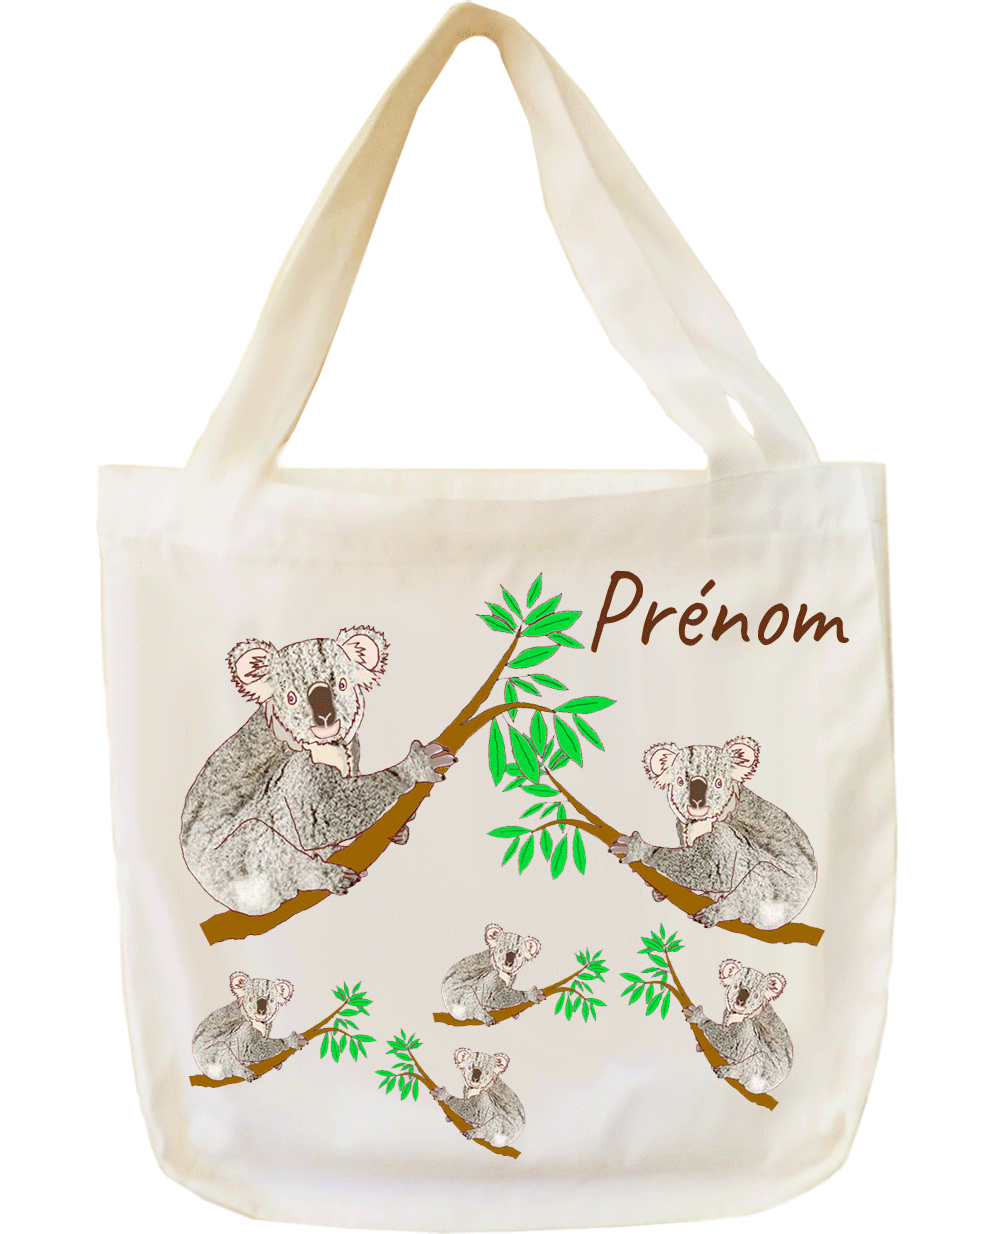 tote-bag;sac;cabas;texti;cadeaux;personnalisable;personnalisation;personnalise;prenom;animal;koala